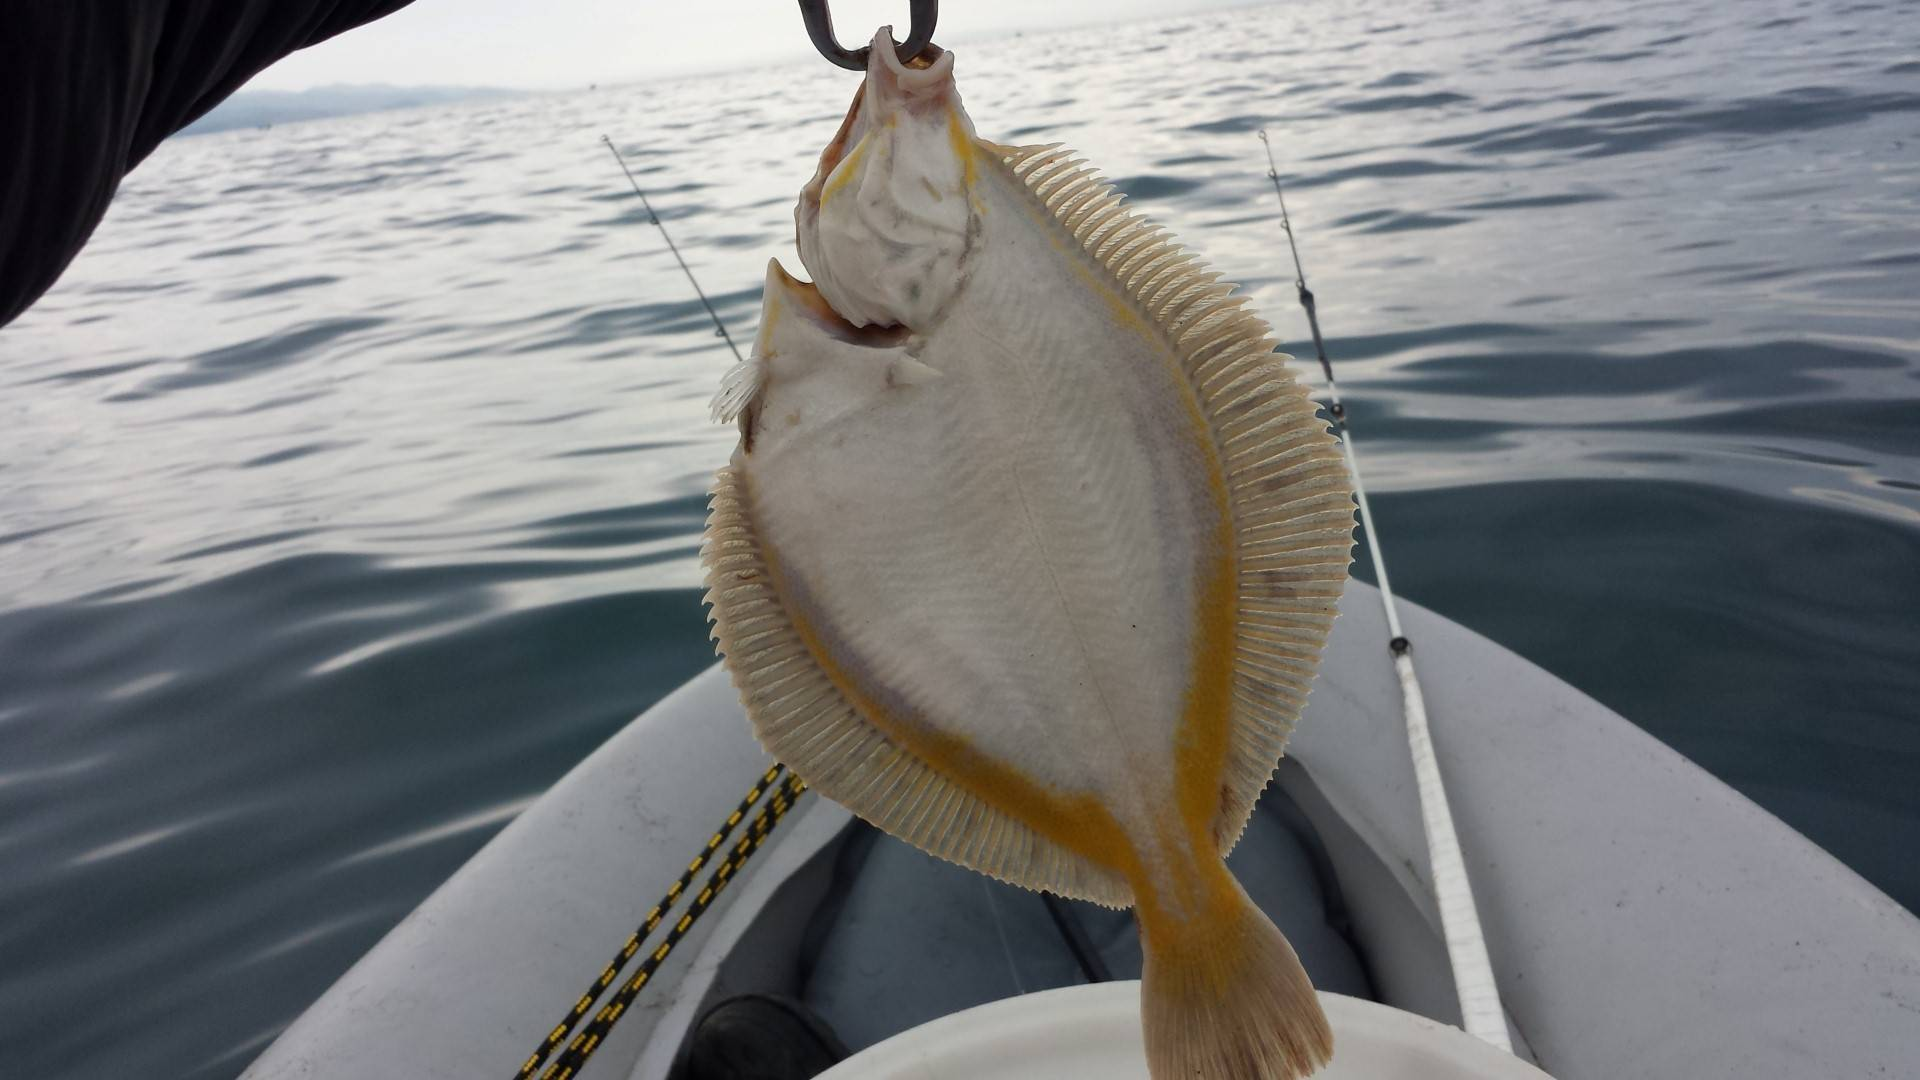 Камбала - морская рыба или речная?